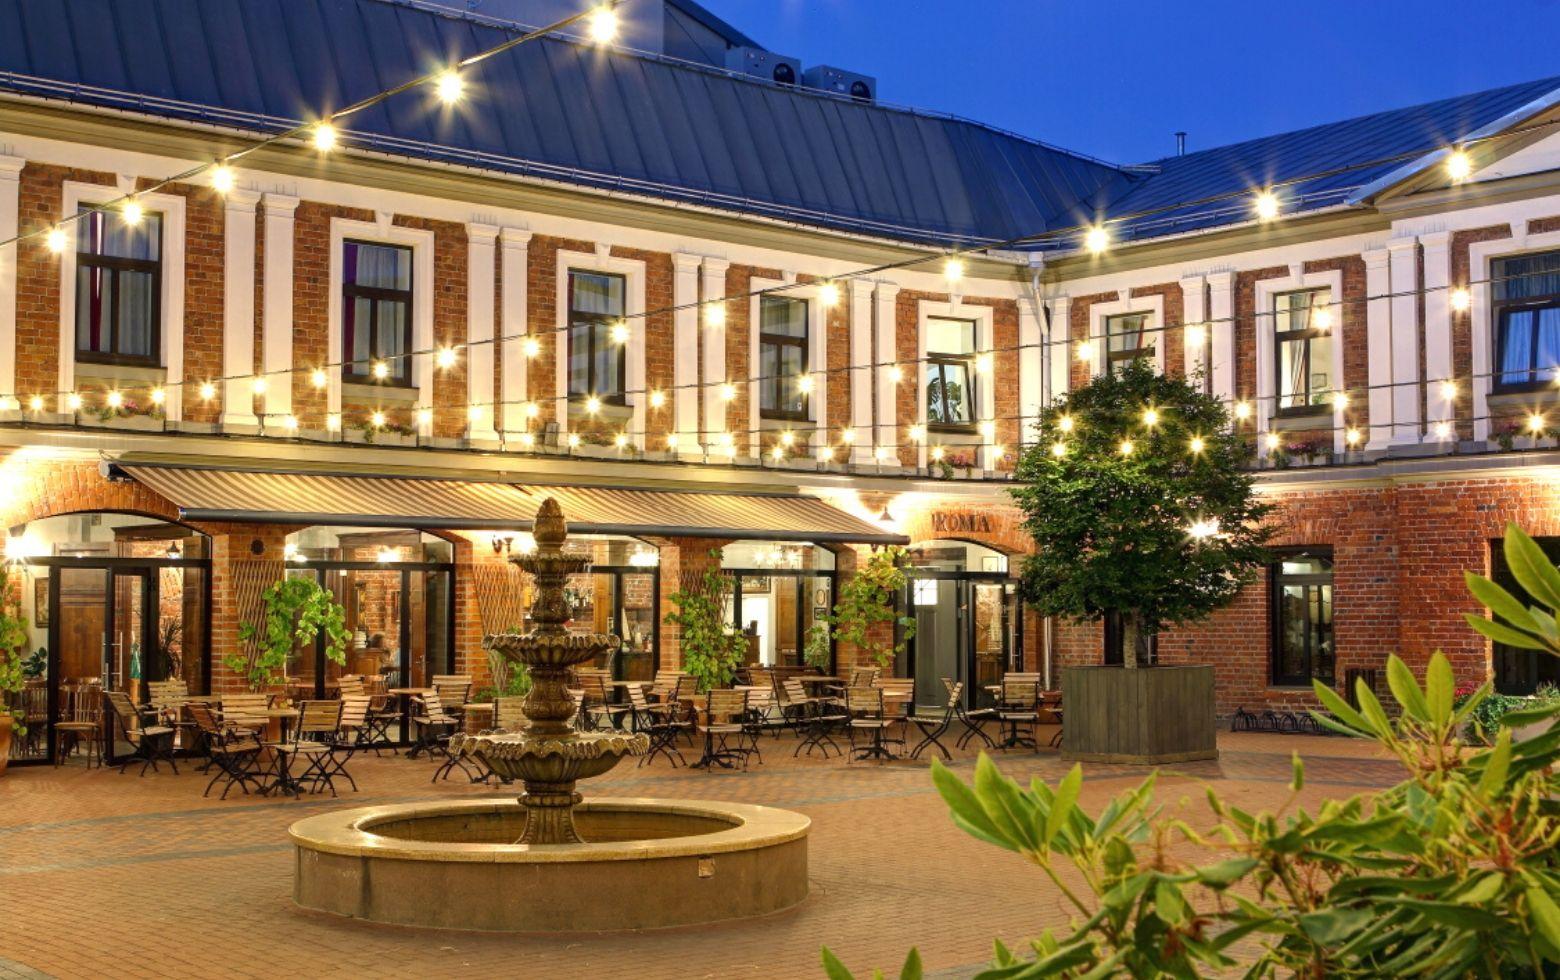 gospa-viesnicas-gal-art-hotel-roma3